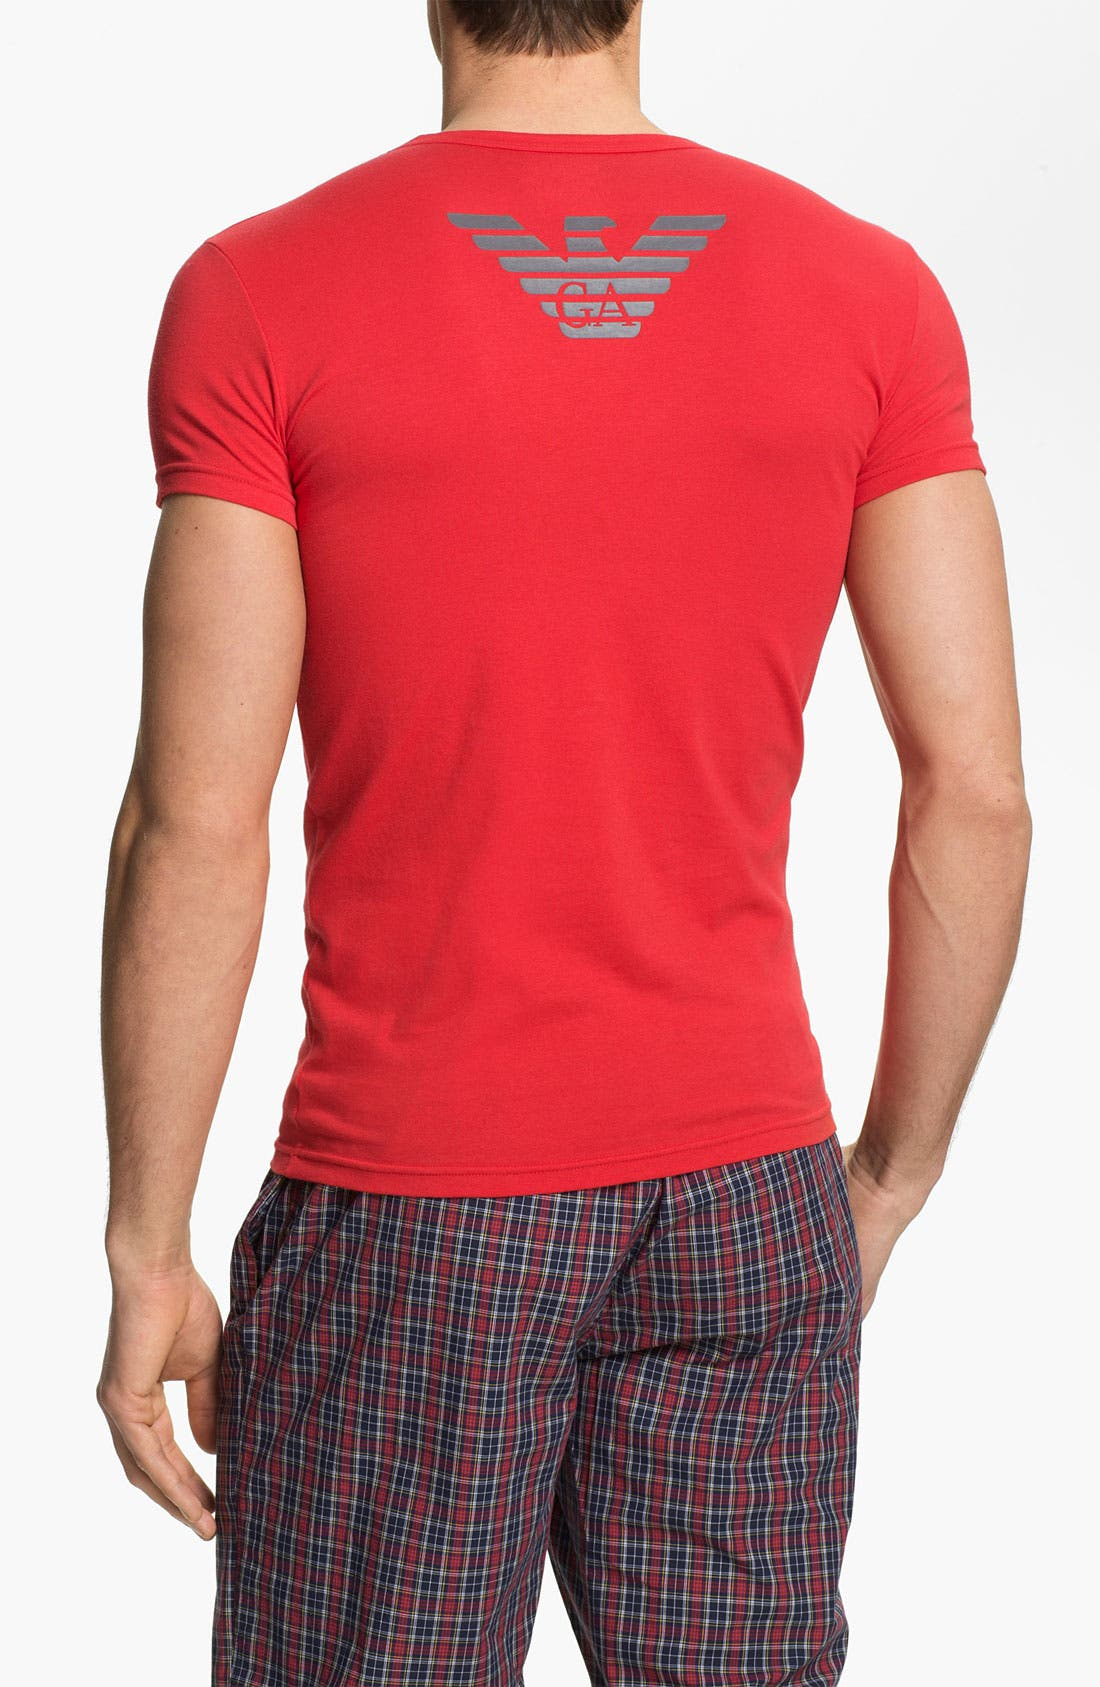 Alternate Image 2  - Emporio Armani 'Eagle' Stretch Cotton Crewneck T-Shirt